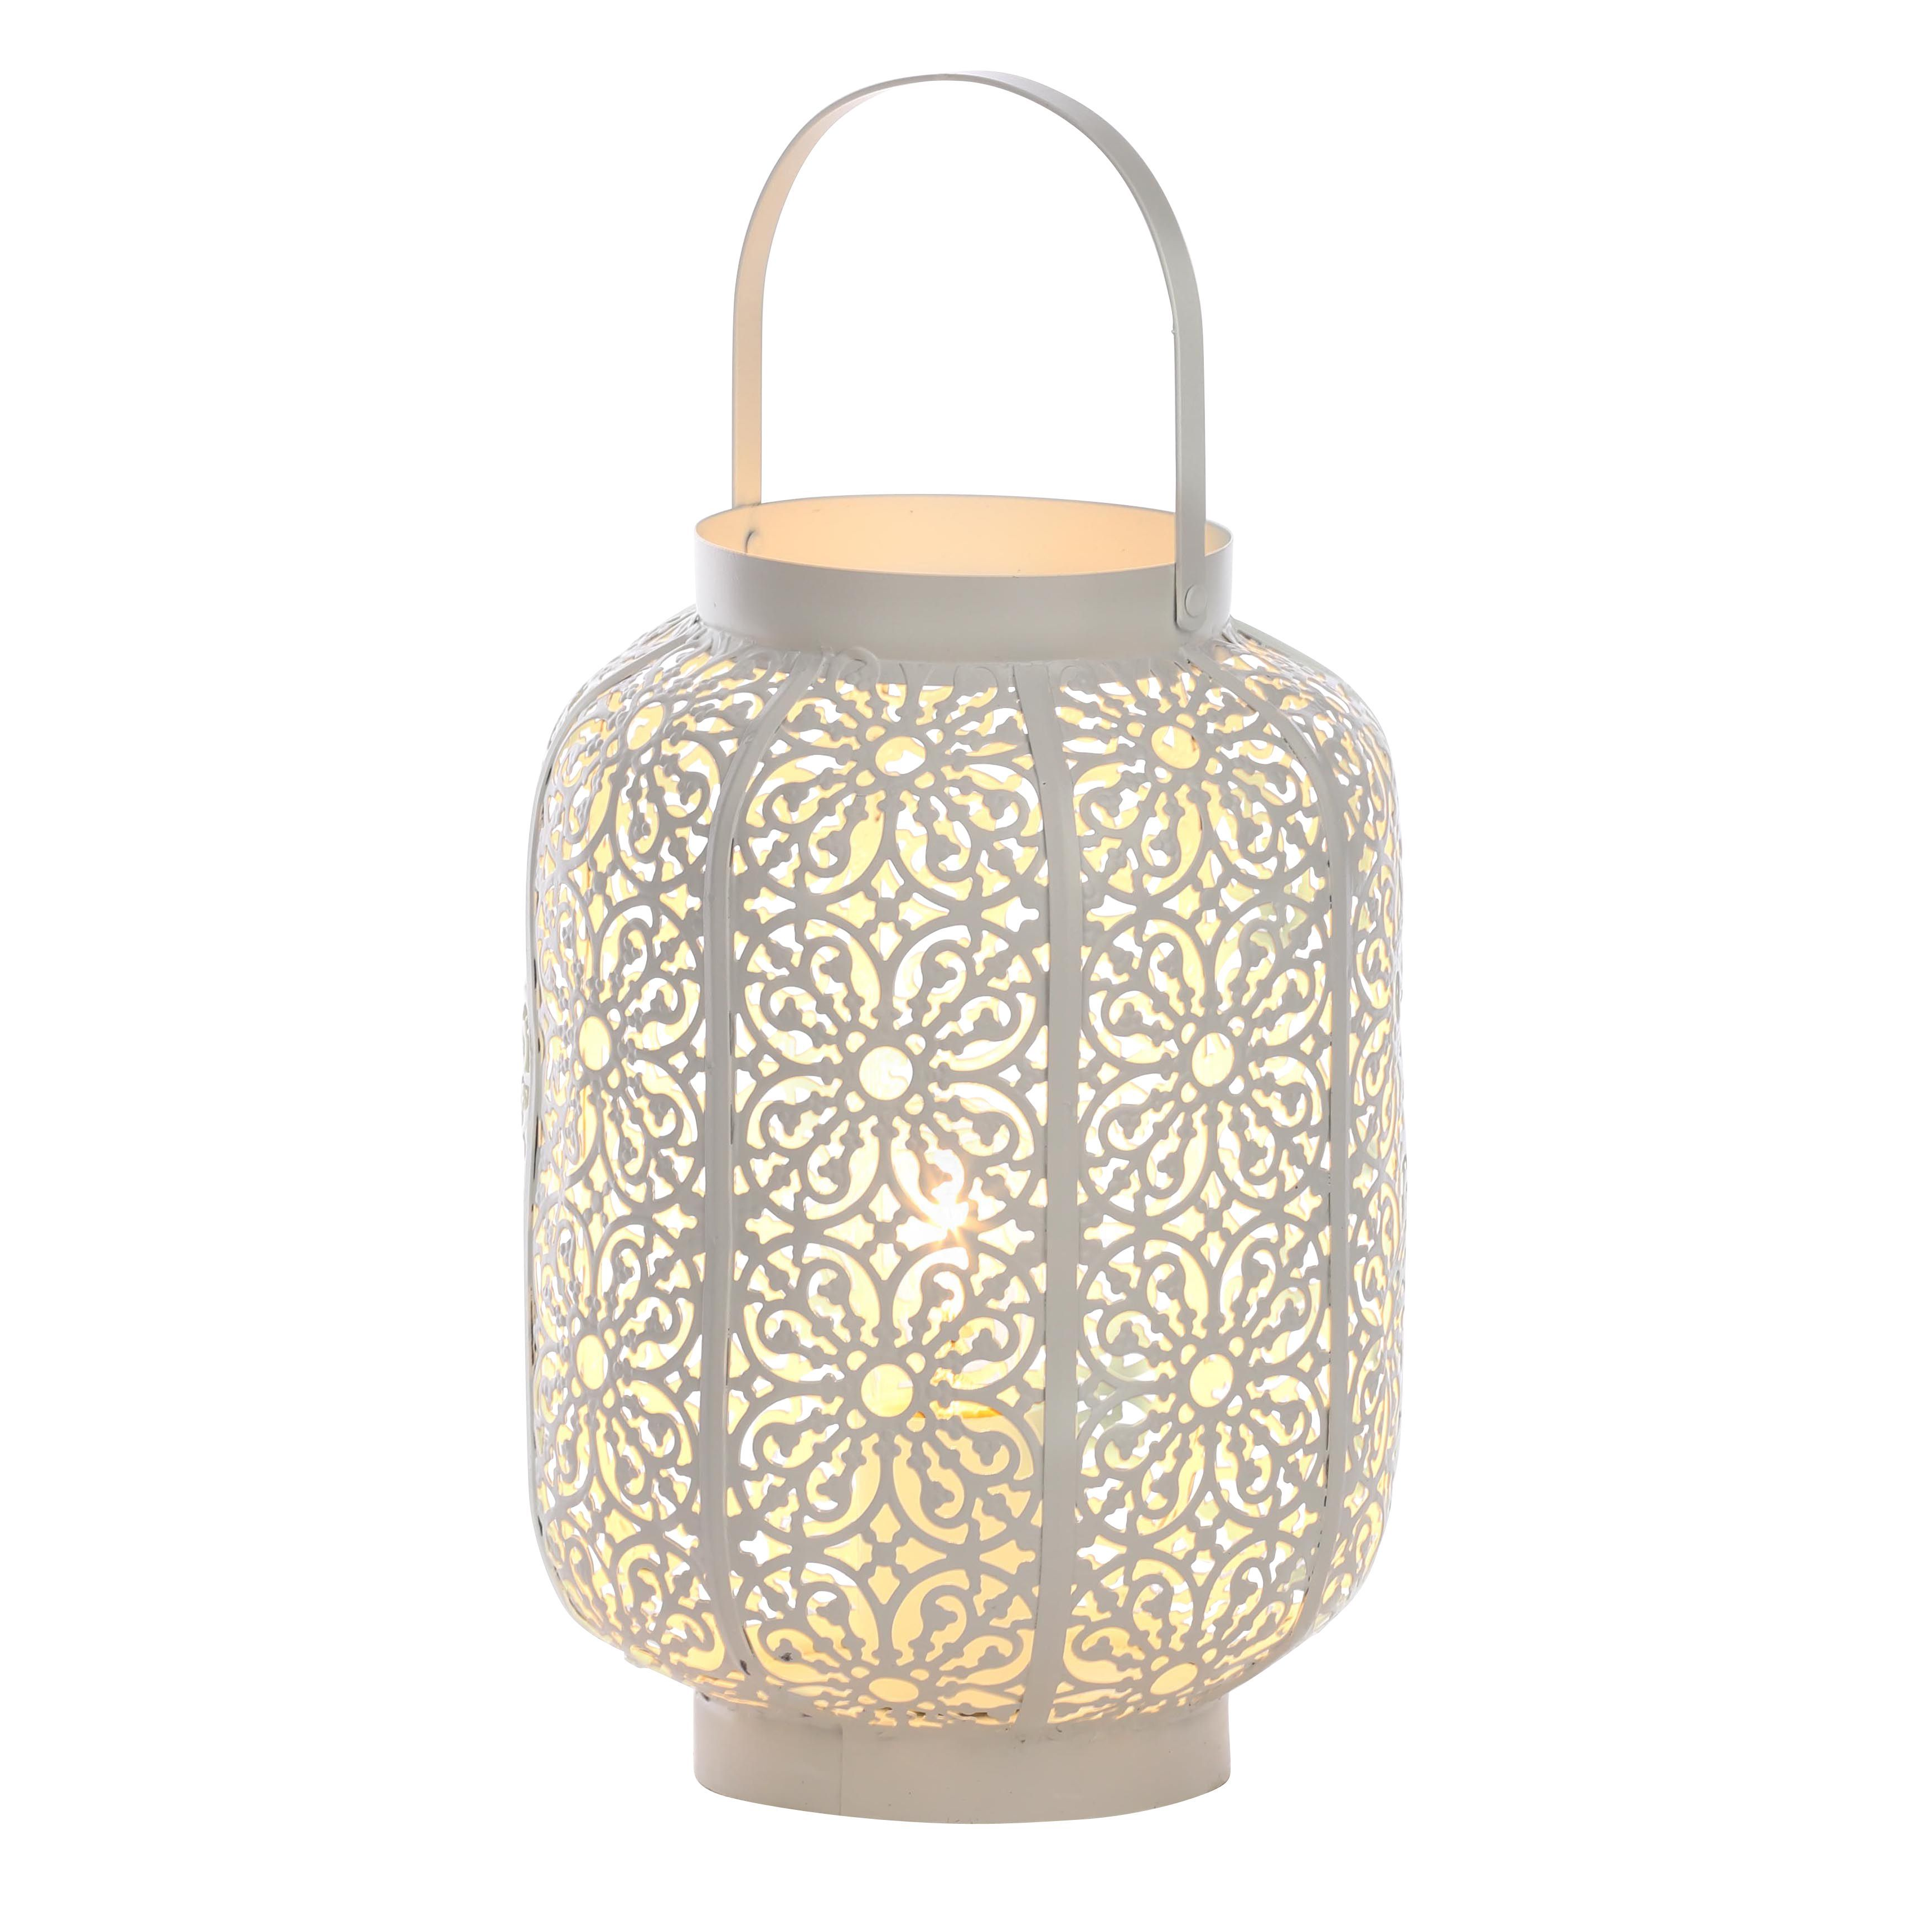 Moroccan Lantern White Table Lamp | Departments | DIY at B&Q